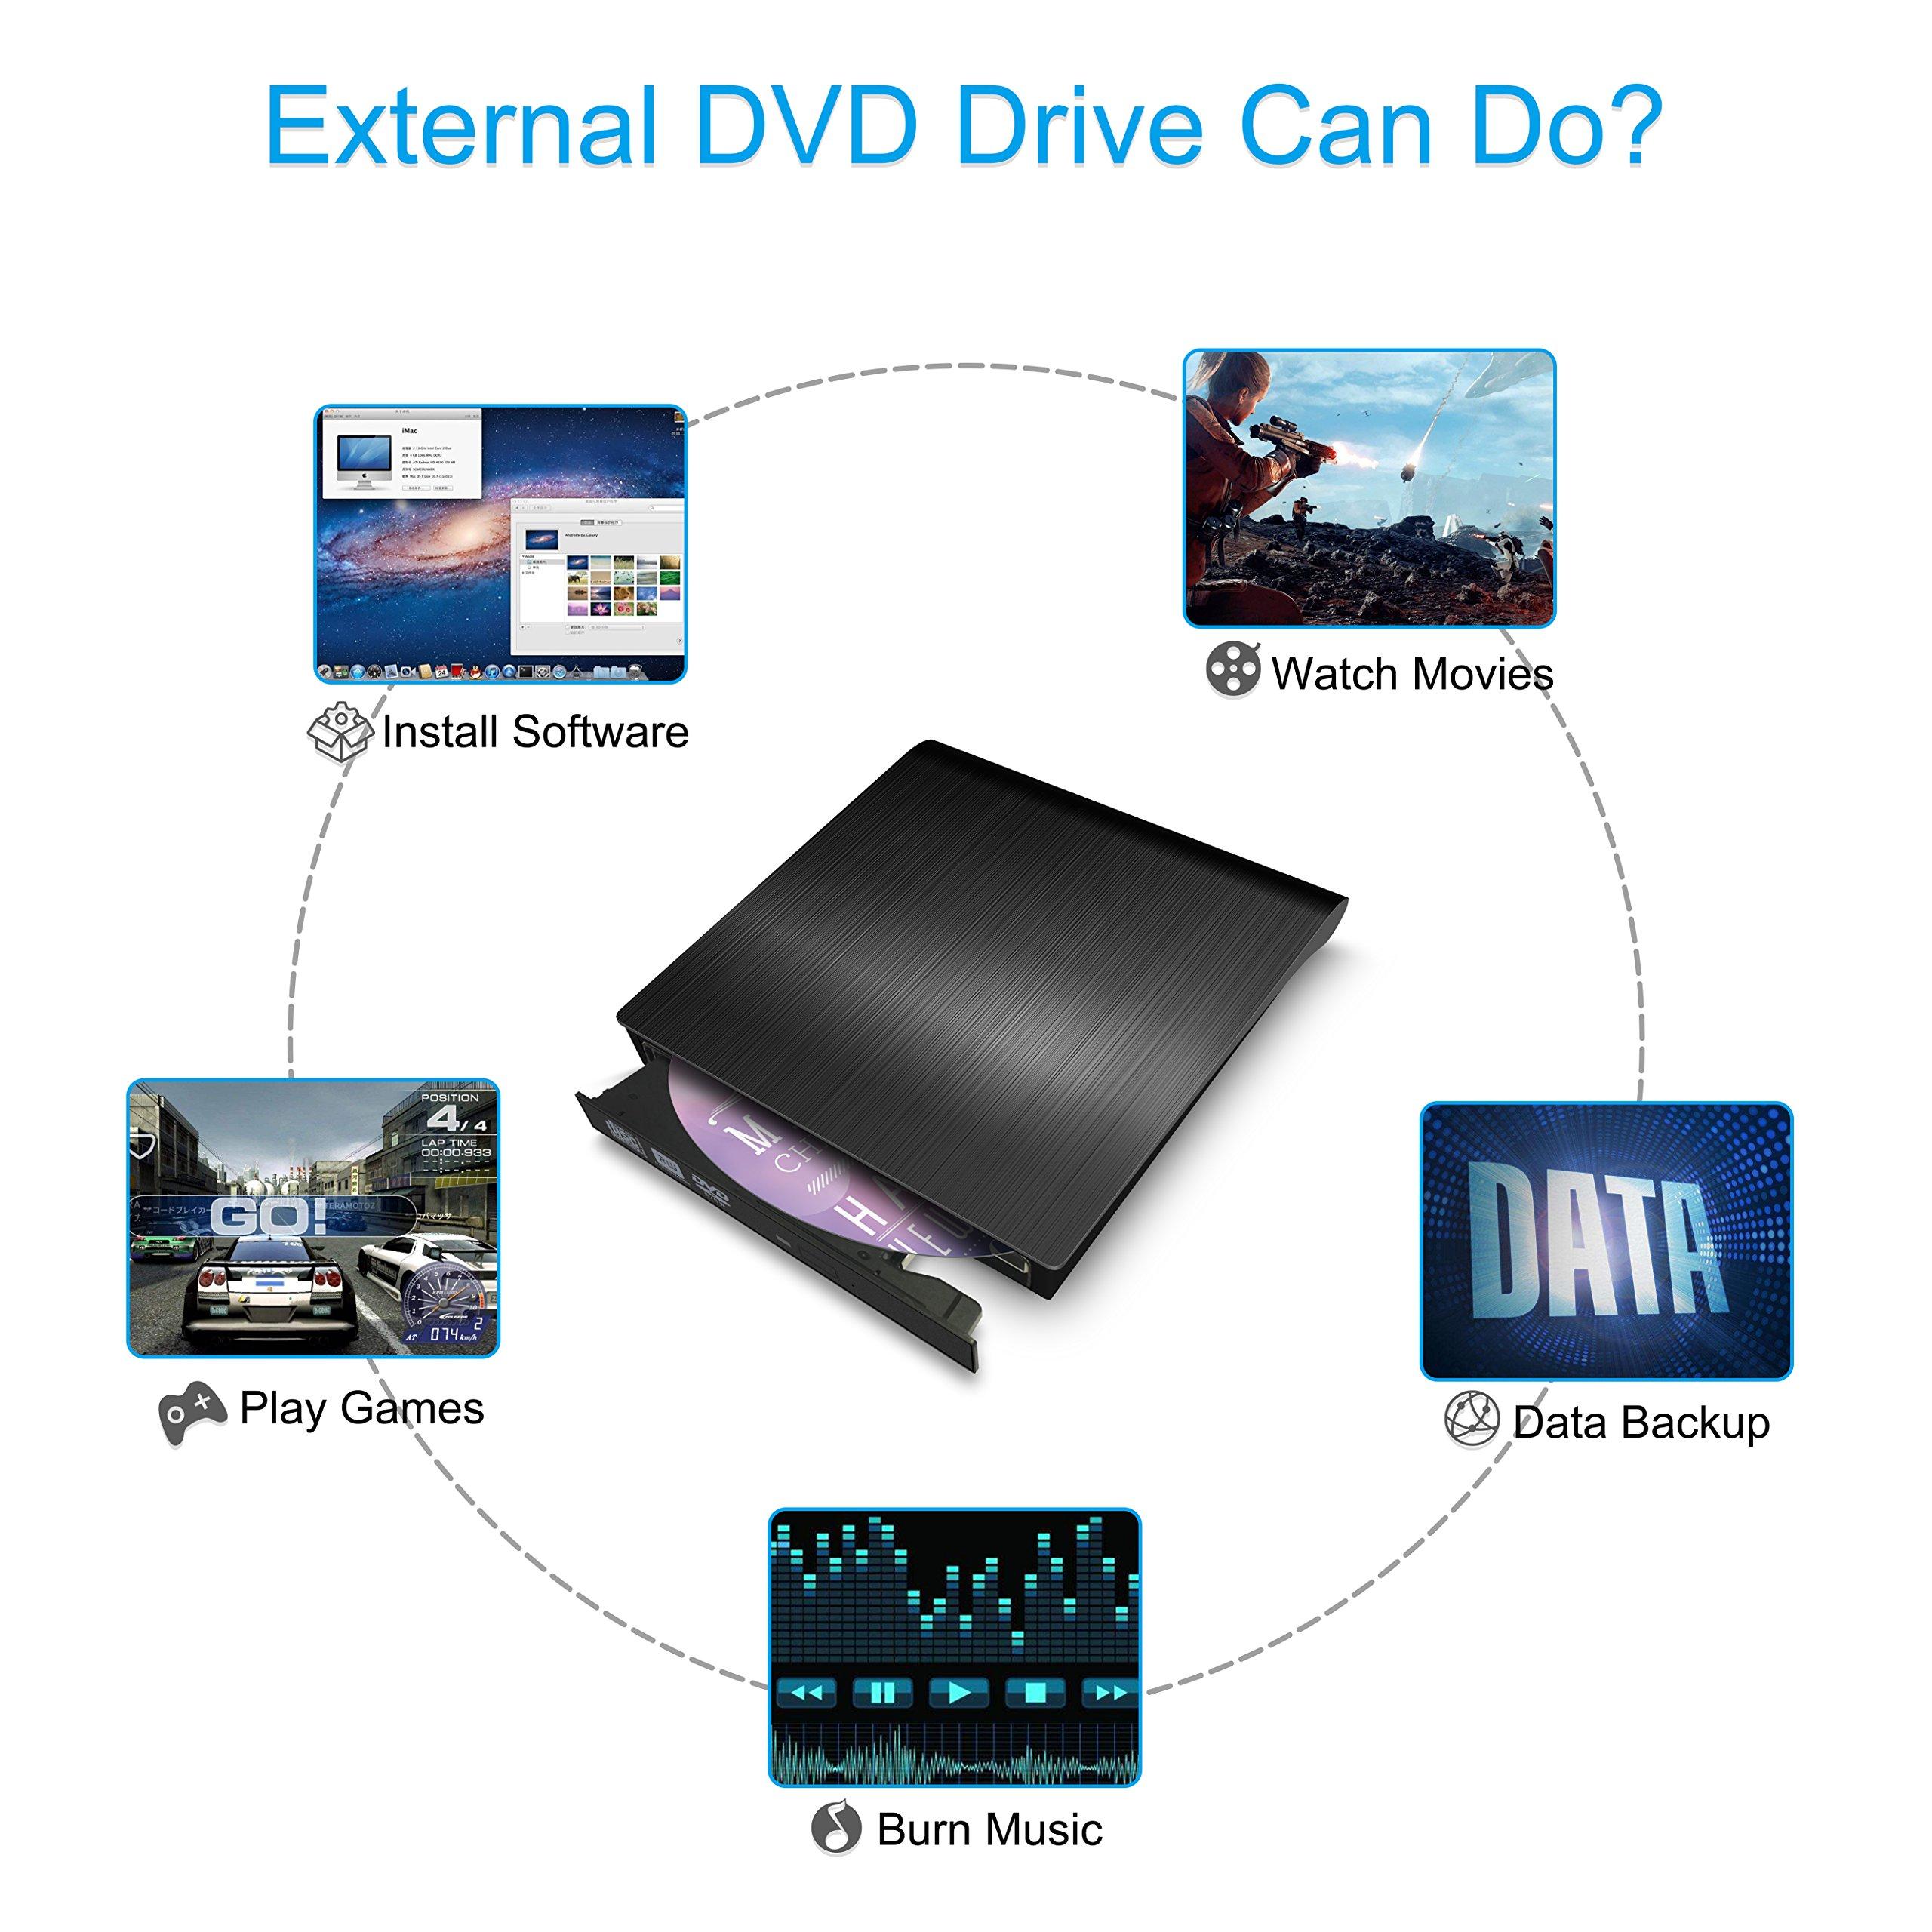 External CD DVD Drive,Valoin High Speed USB 3.0 Data Transfer Super Slim CD DVD-RW DVD ROM Drive for Laptop Desktop MacBook Win 7/8/10/Vista/Mac OS by Valoin (Image #5)